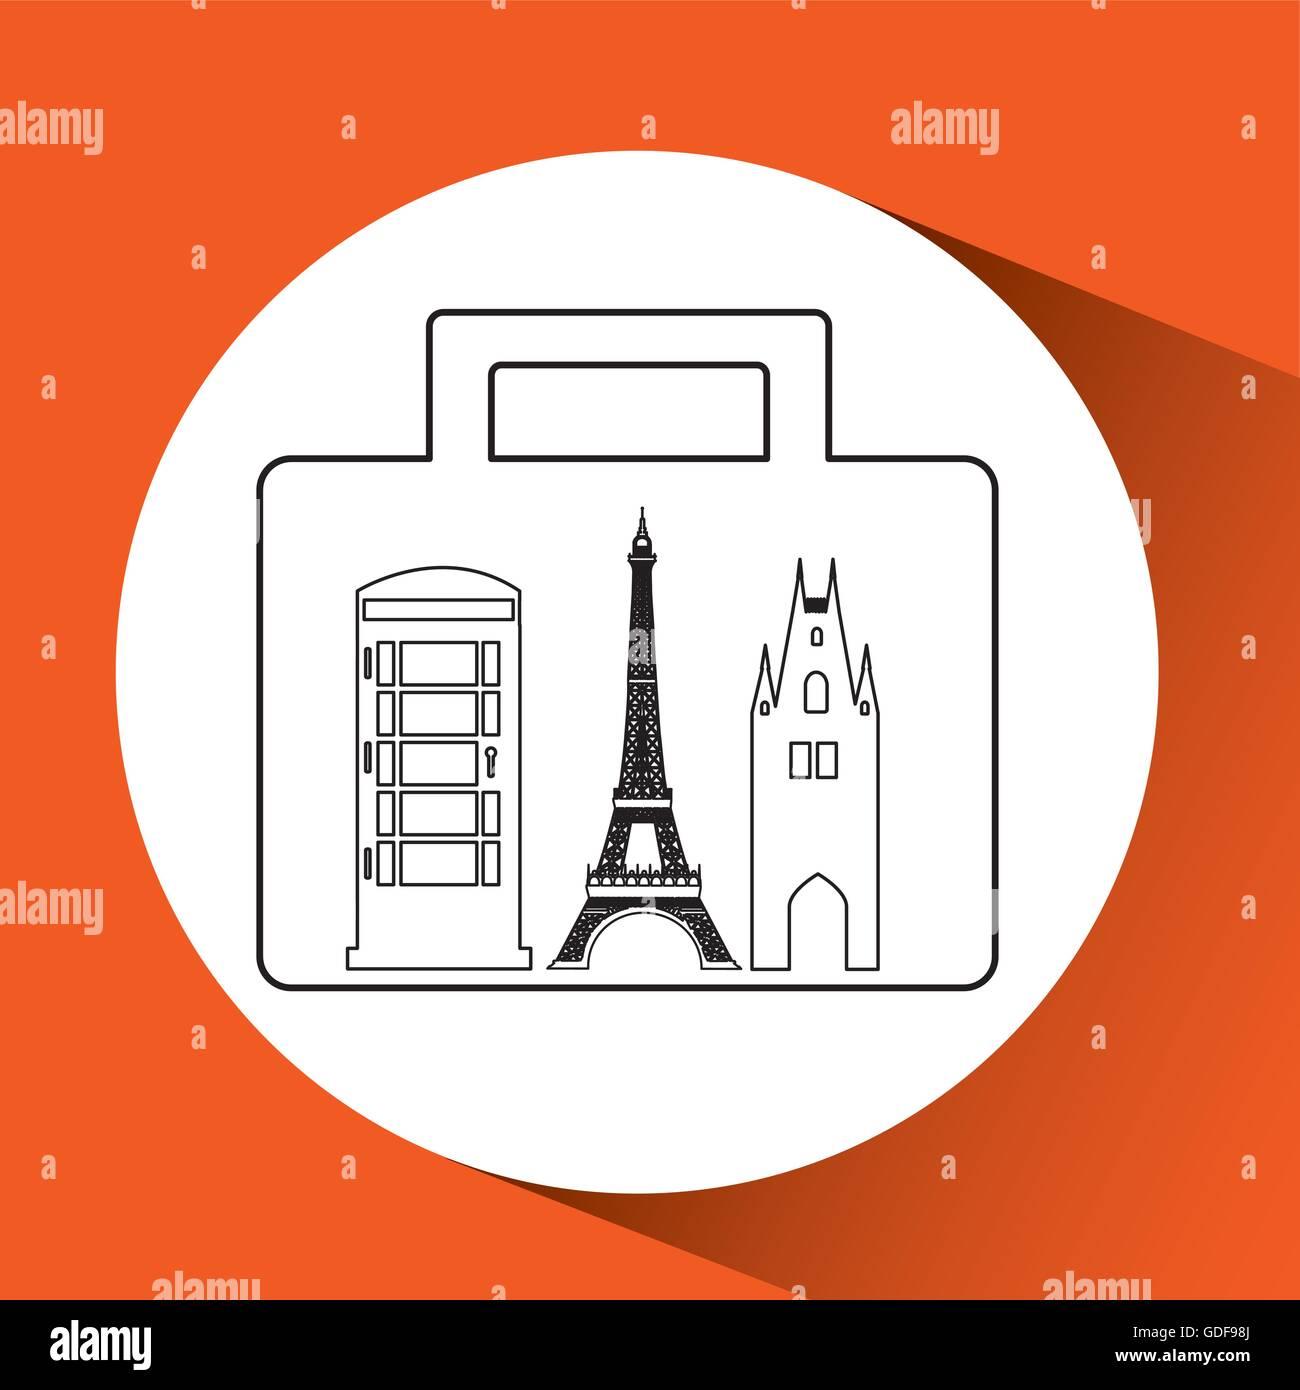 people travel destination - Stock Vector